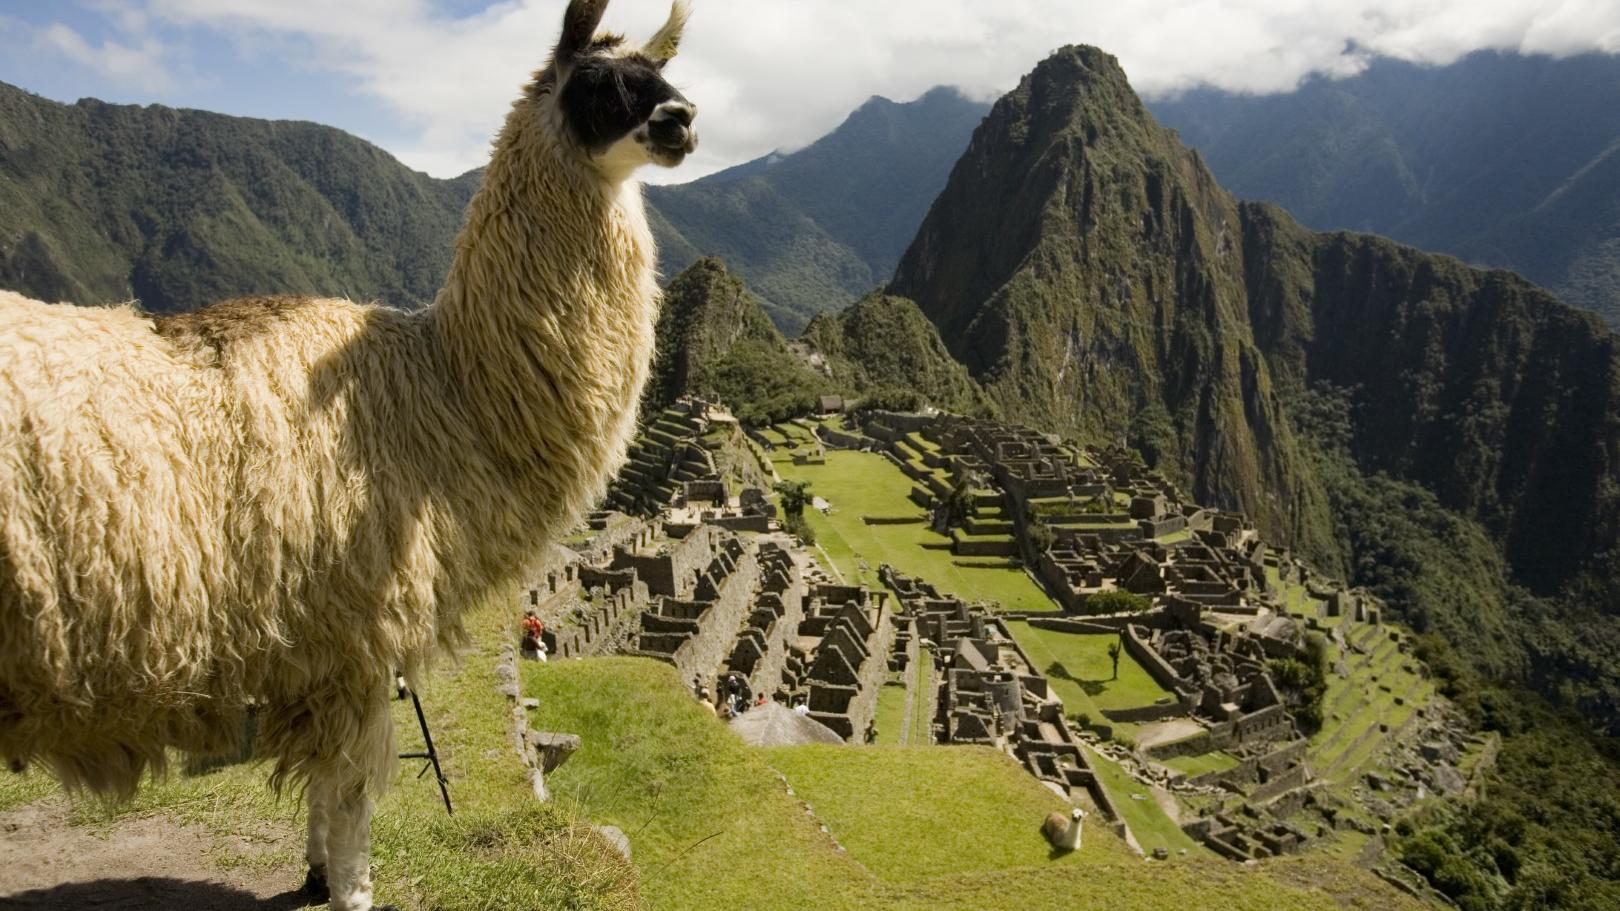 Photo of Machu Picchu with a Llama